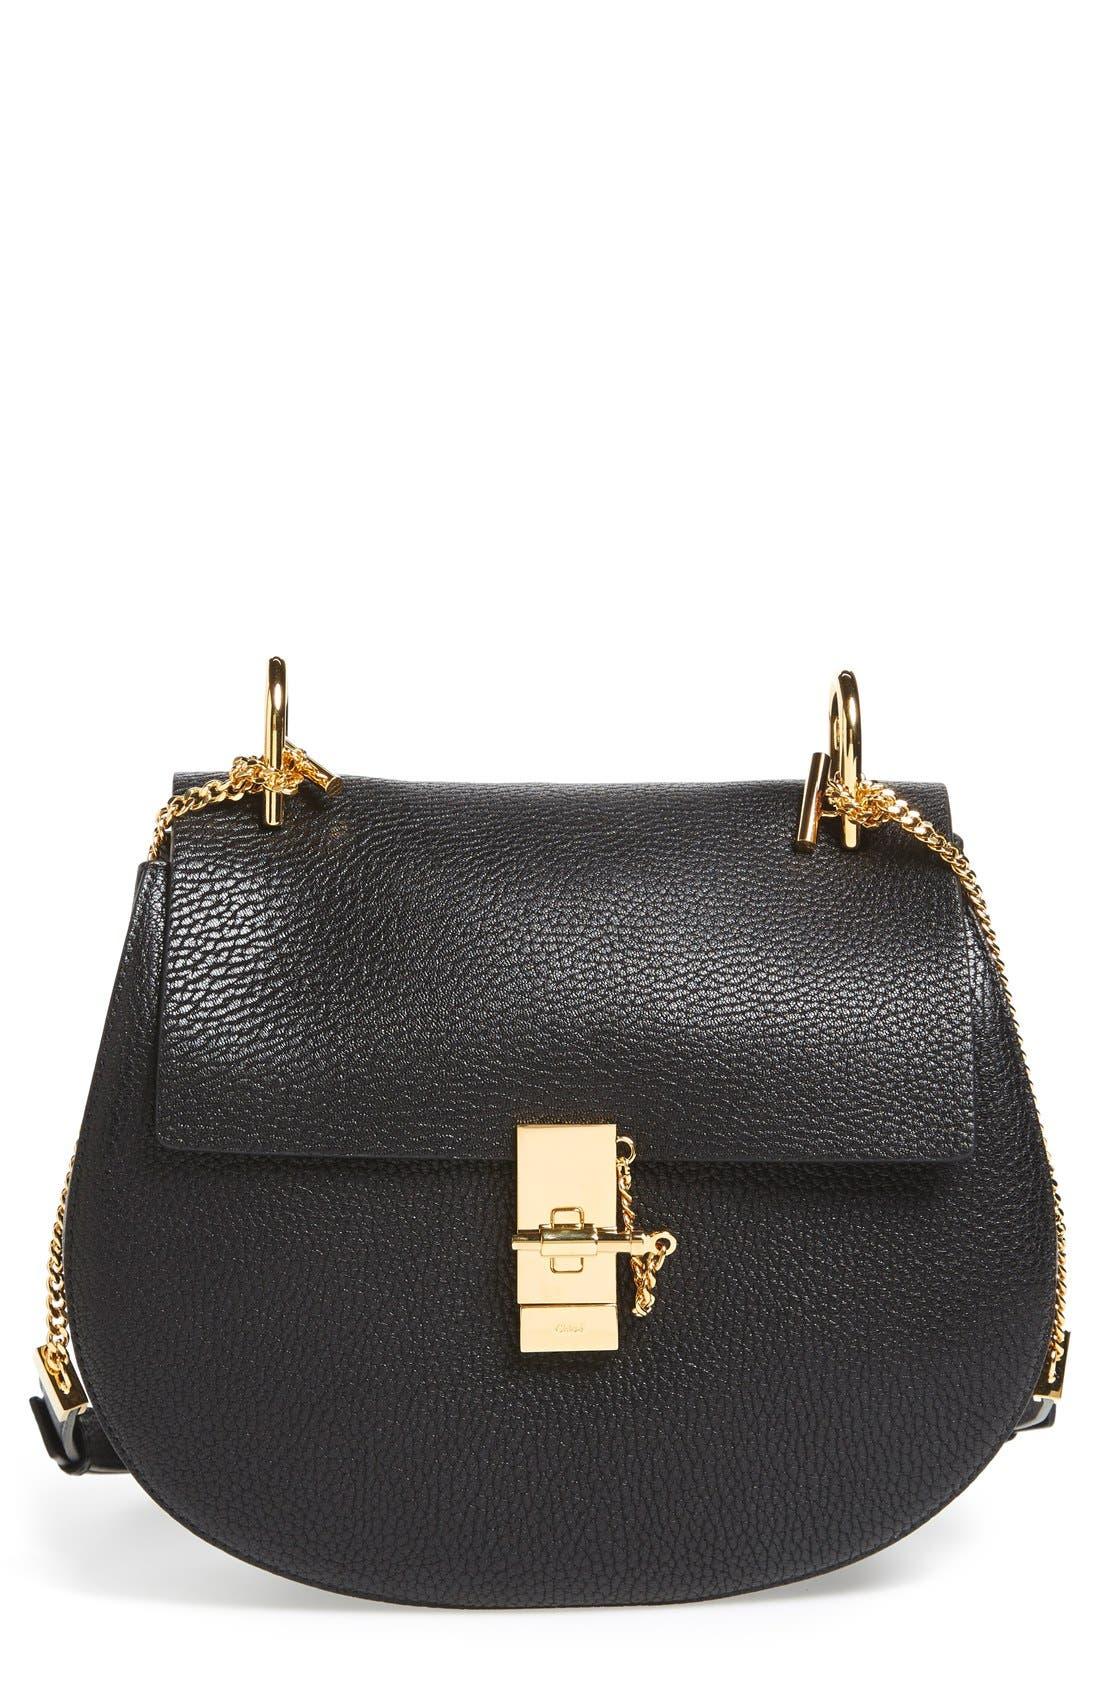 Main Image - Chloé 'Drew' Lambskin Leather Shoulder Bag